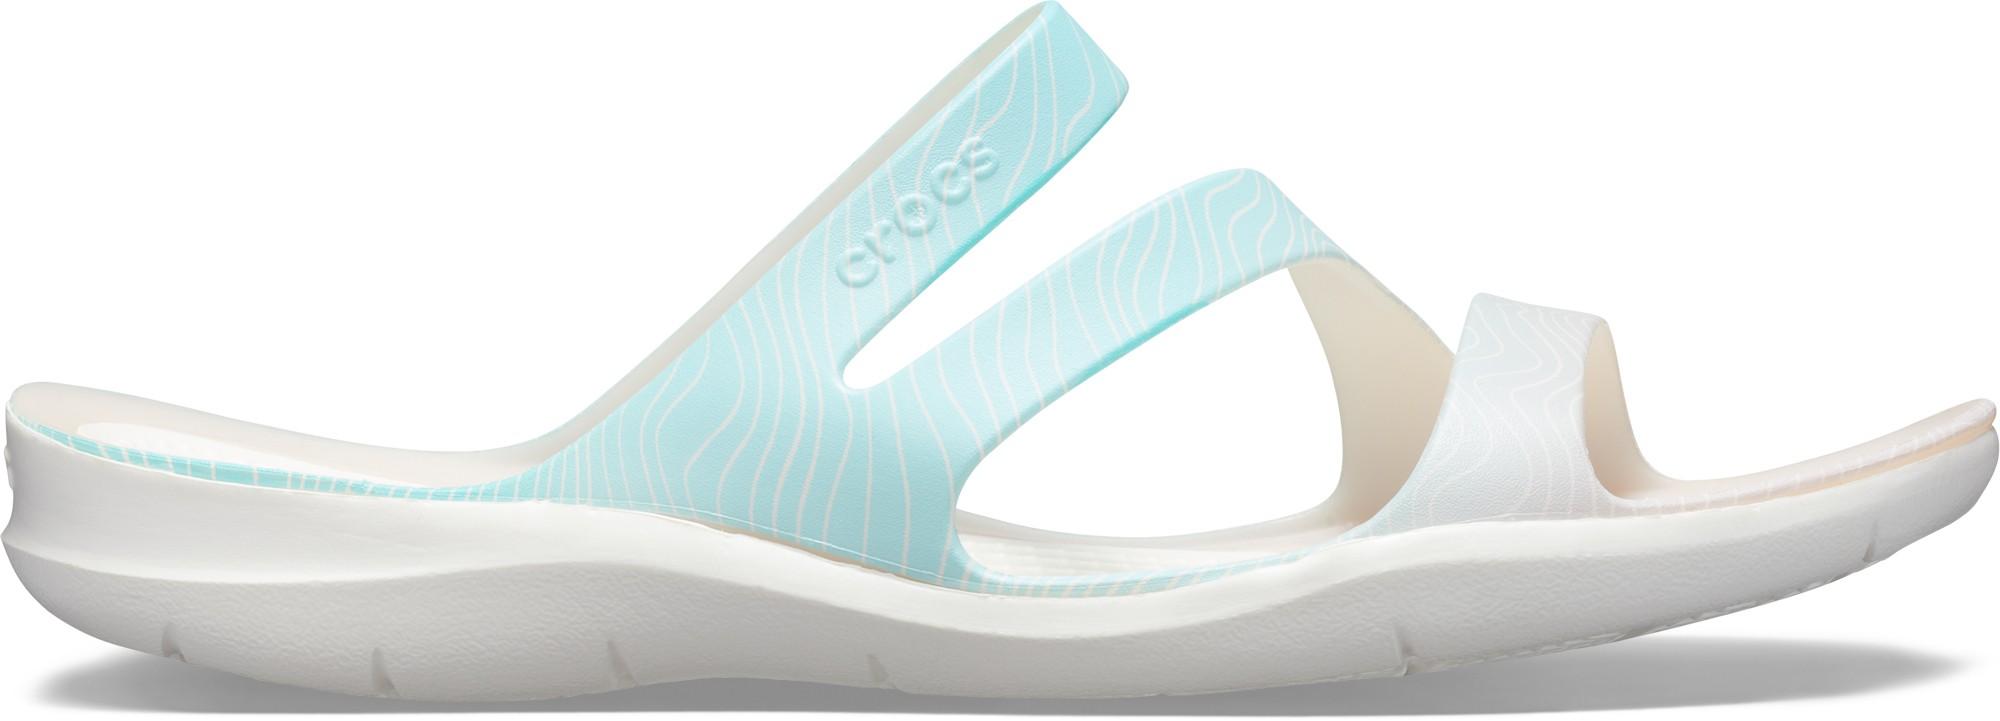 Crocs™ Swiftwater Seasonal Sandal Women's Pool Ombre/White 36,5